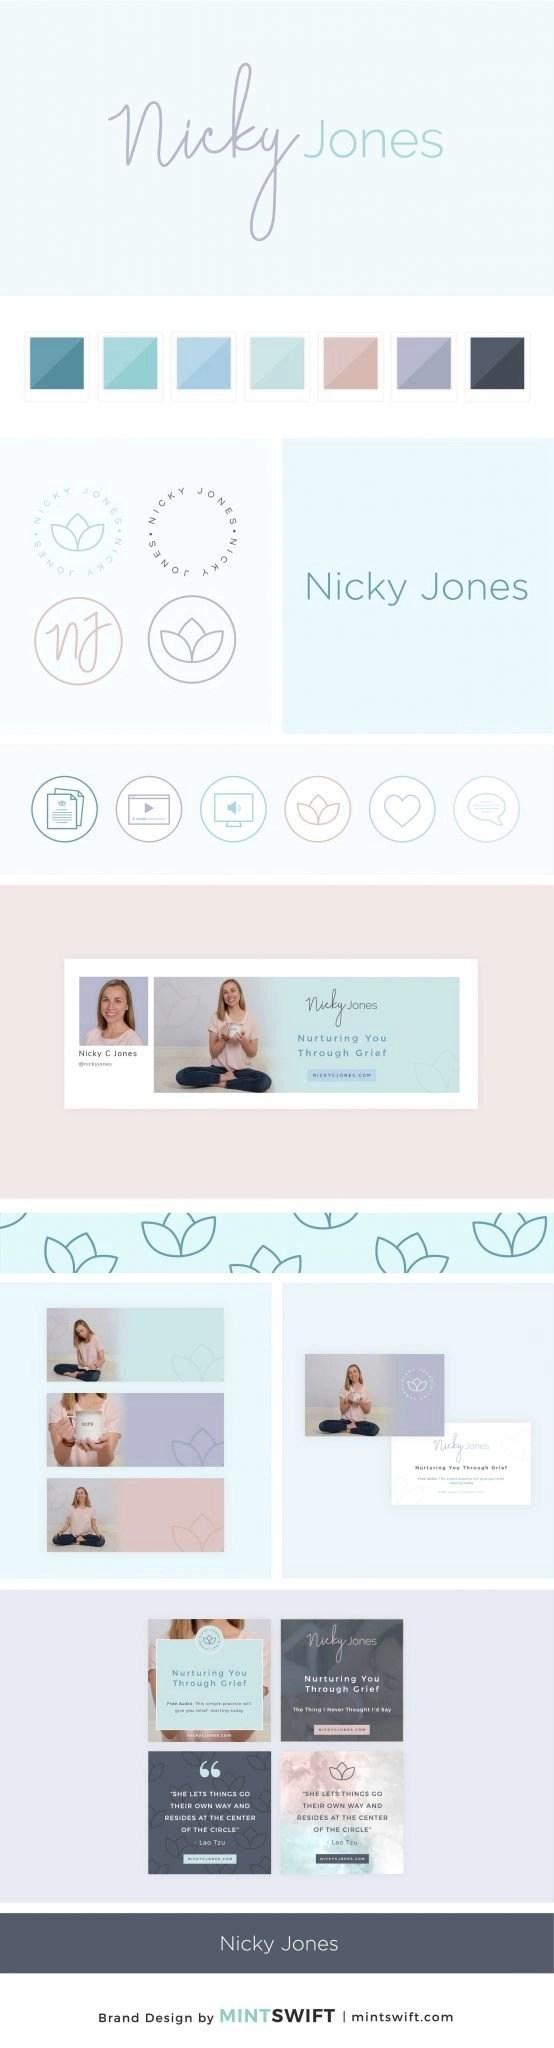 Nicky Jones - Brand Design Package - MintSwift